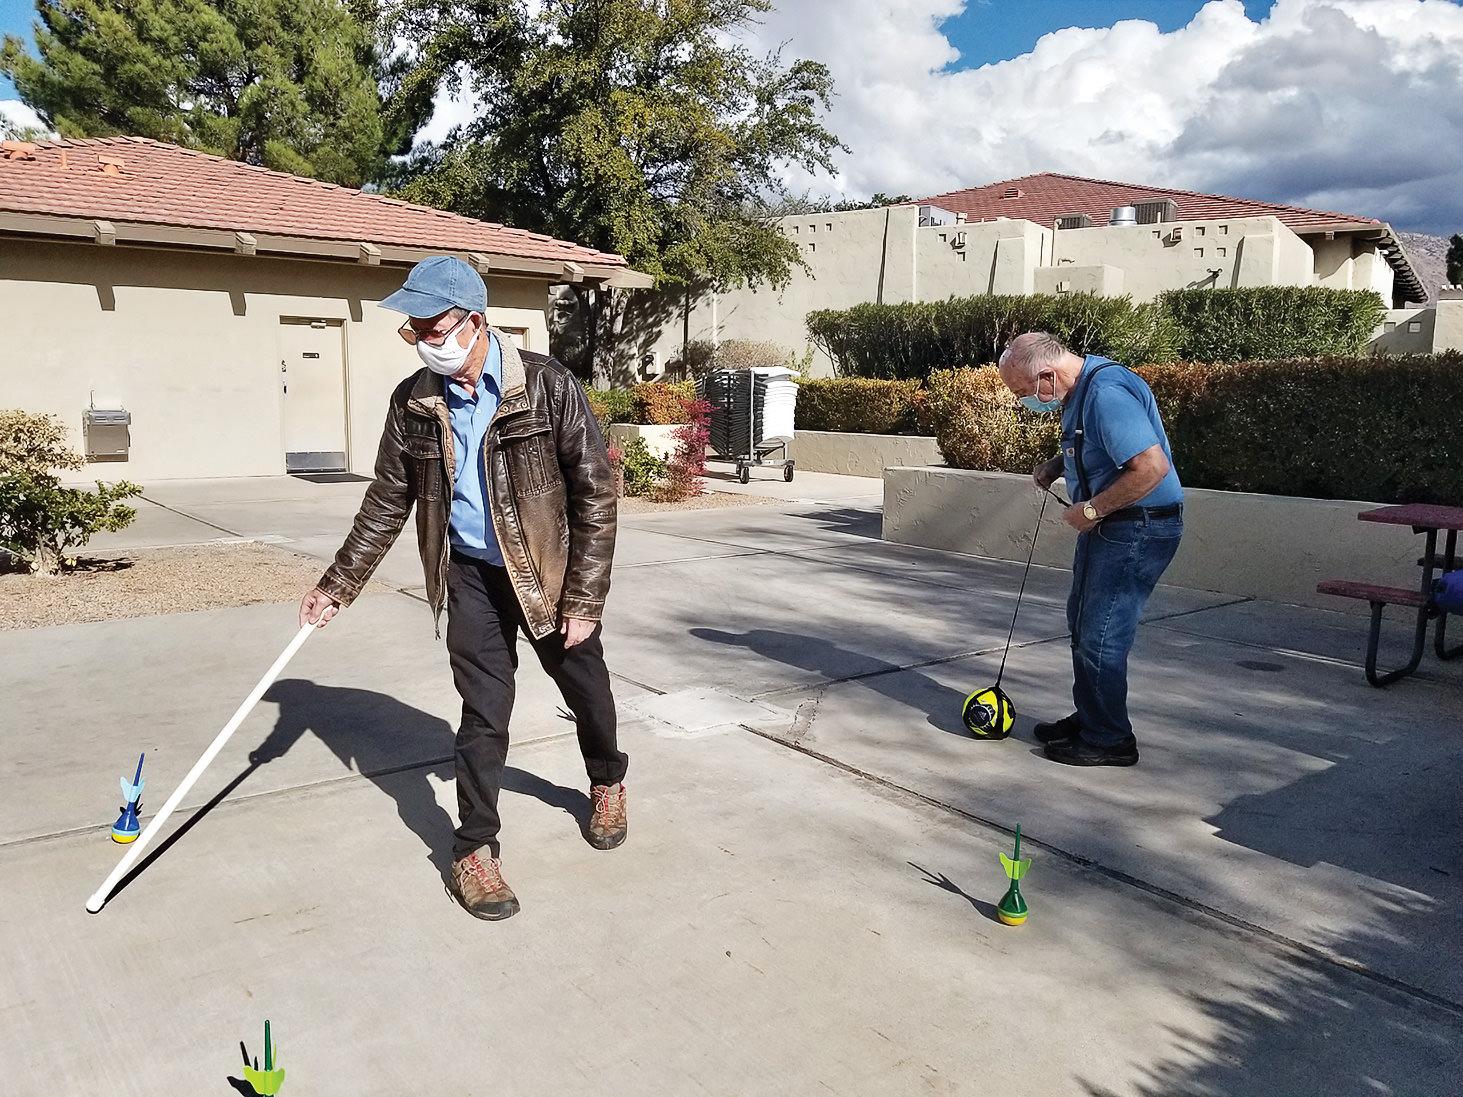 Hans Von Michaelis practicing reach and Ted Birchard practicing kicking while walking.